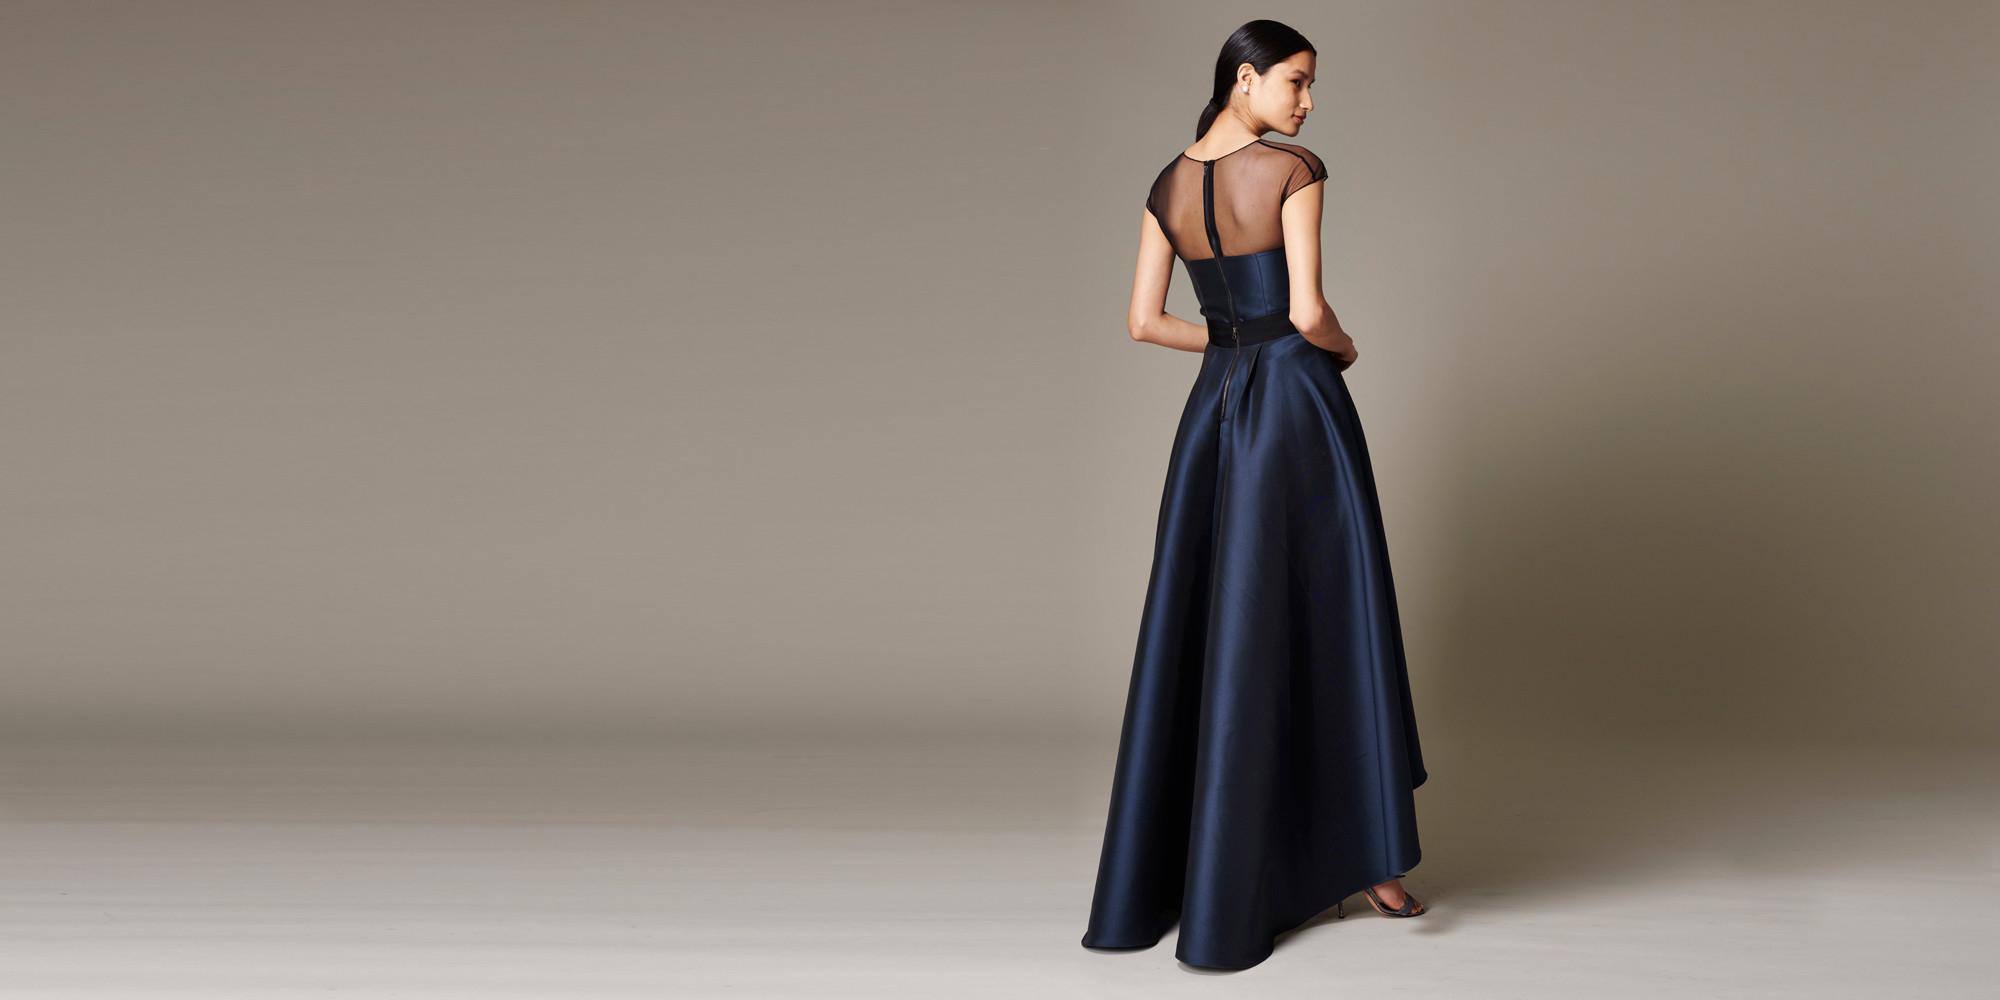 Lyst Sachin & Babi Lisa Silk High Low Gown in Blue